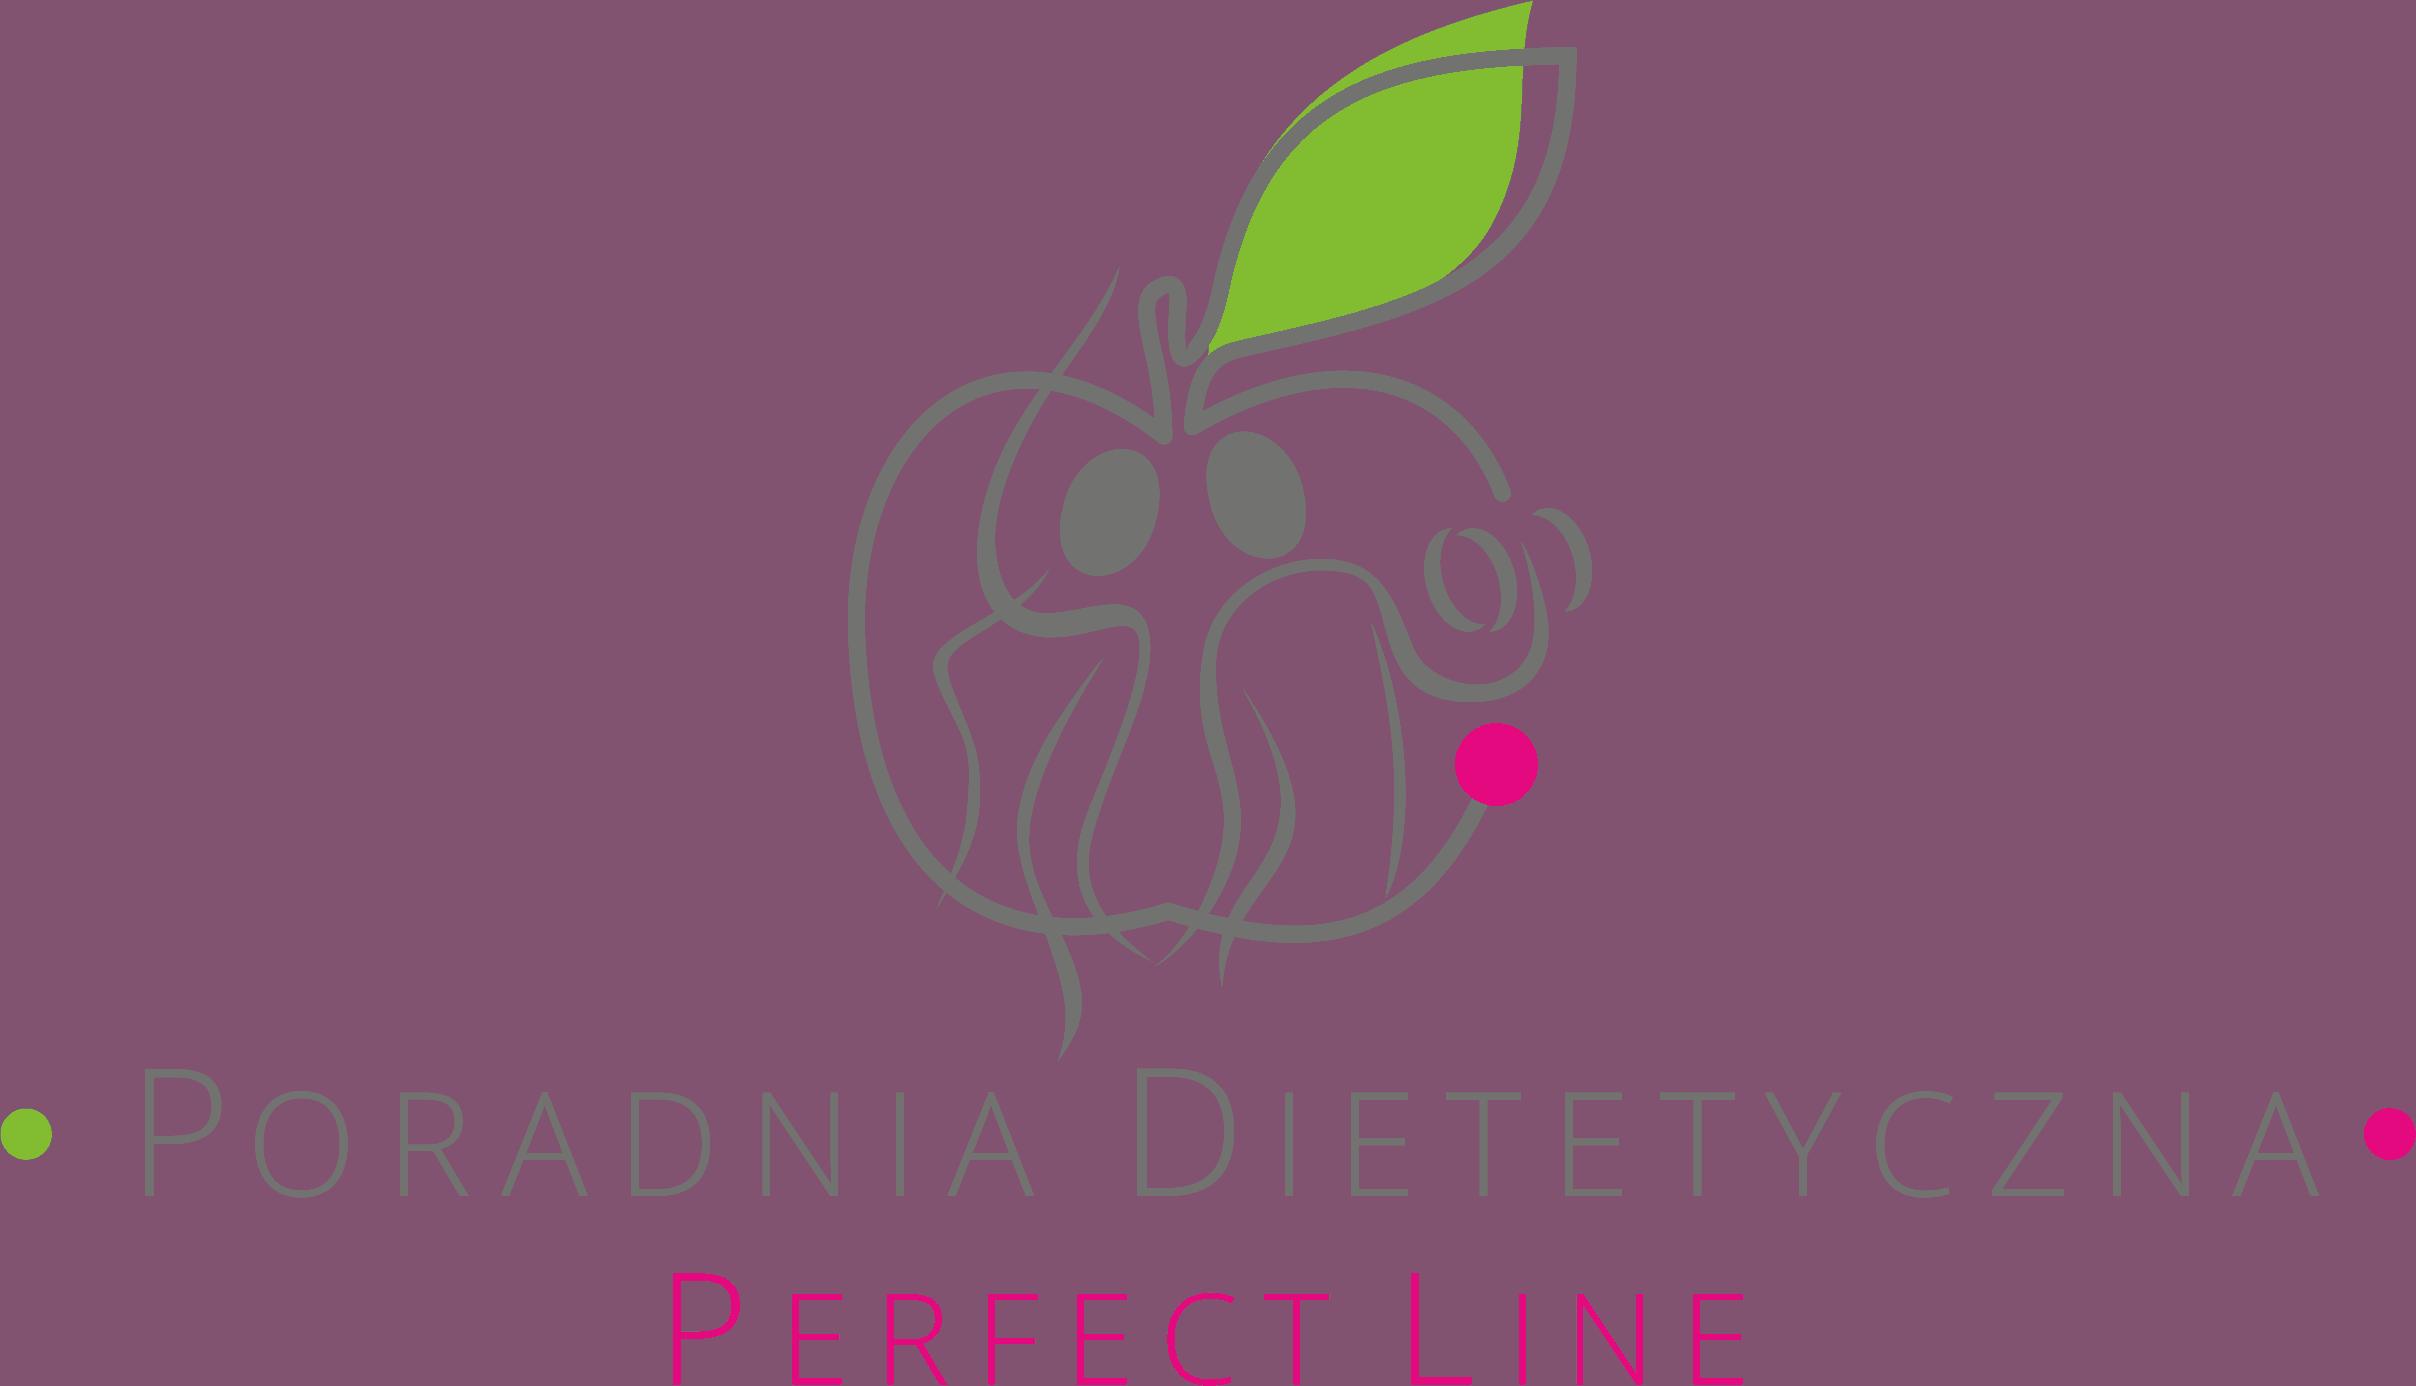 Perfect Line – Poradnia dietetyczna